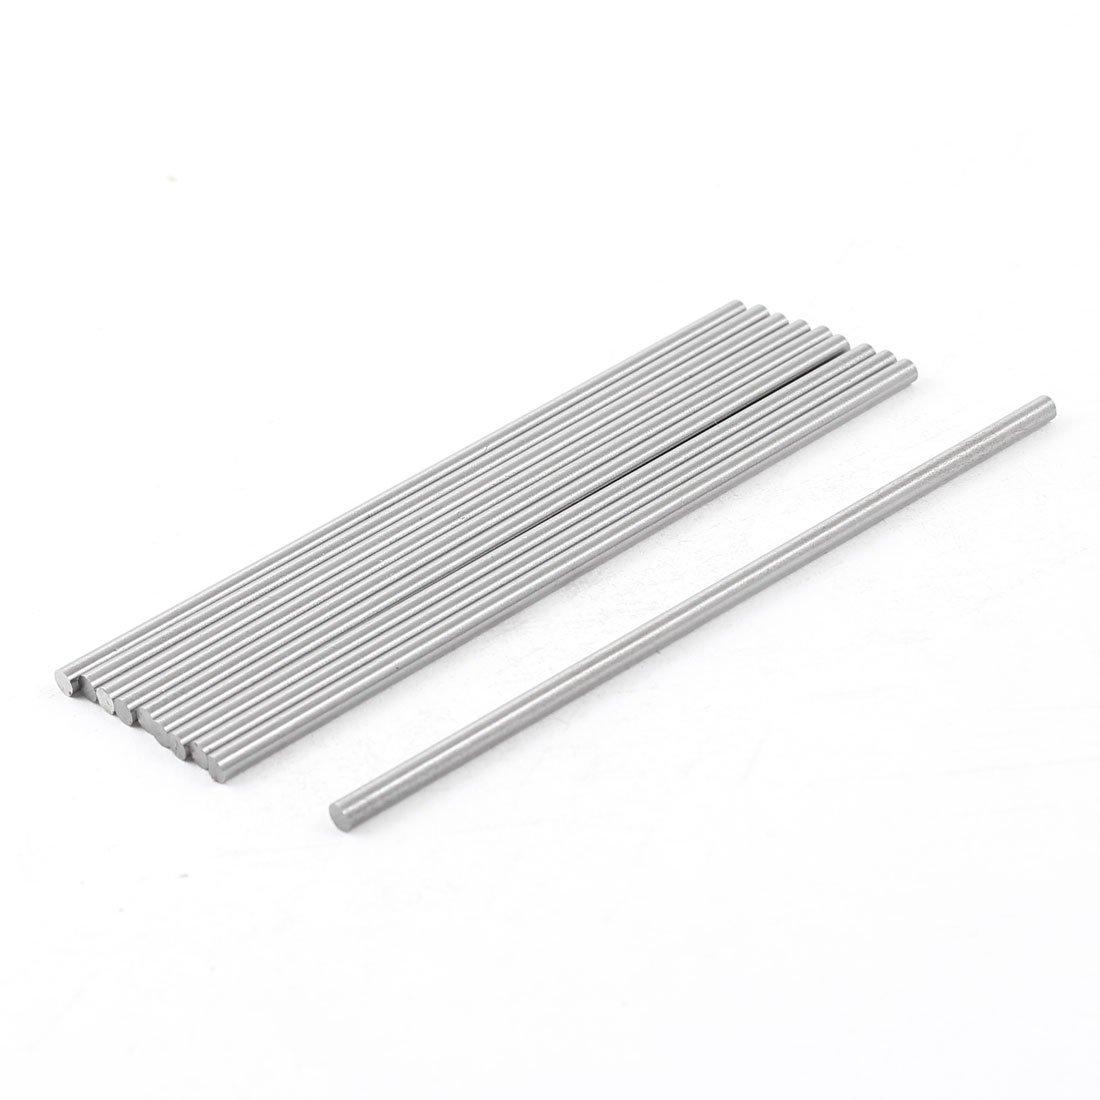 10 PCS 3mm Diameter 100mm Long Boring Tool Round Turning Lathe Bars Sourcingmap a14021900ux0145